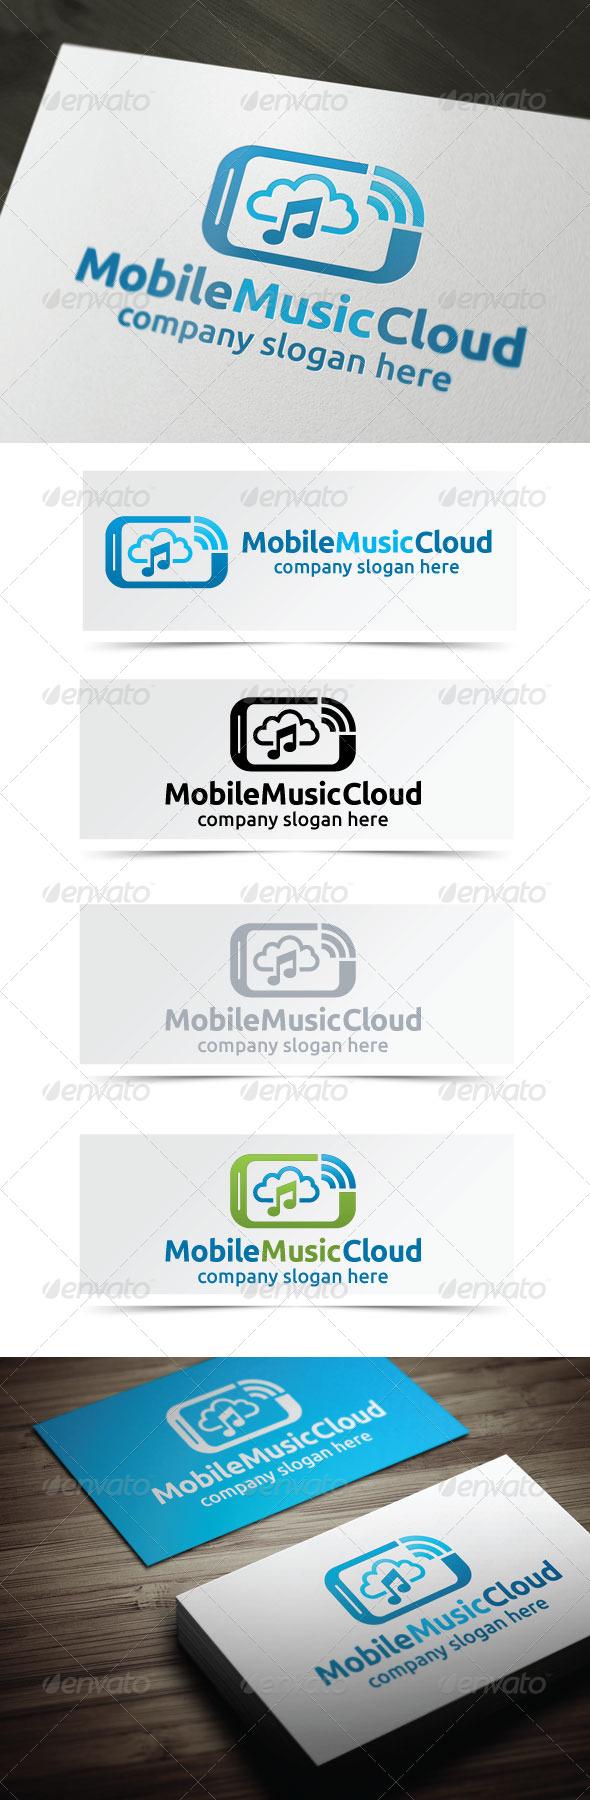 Mobile Music Cloud